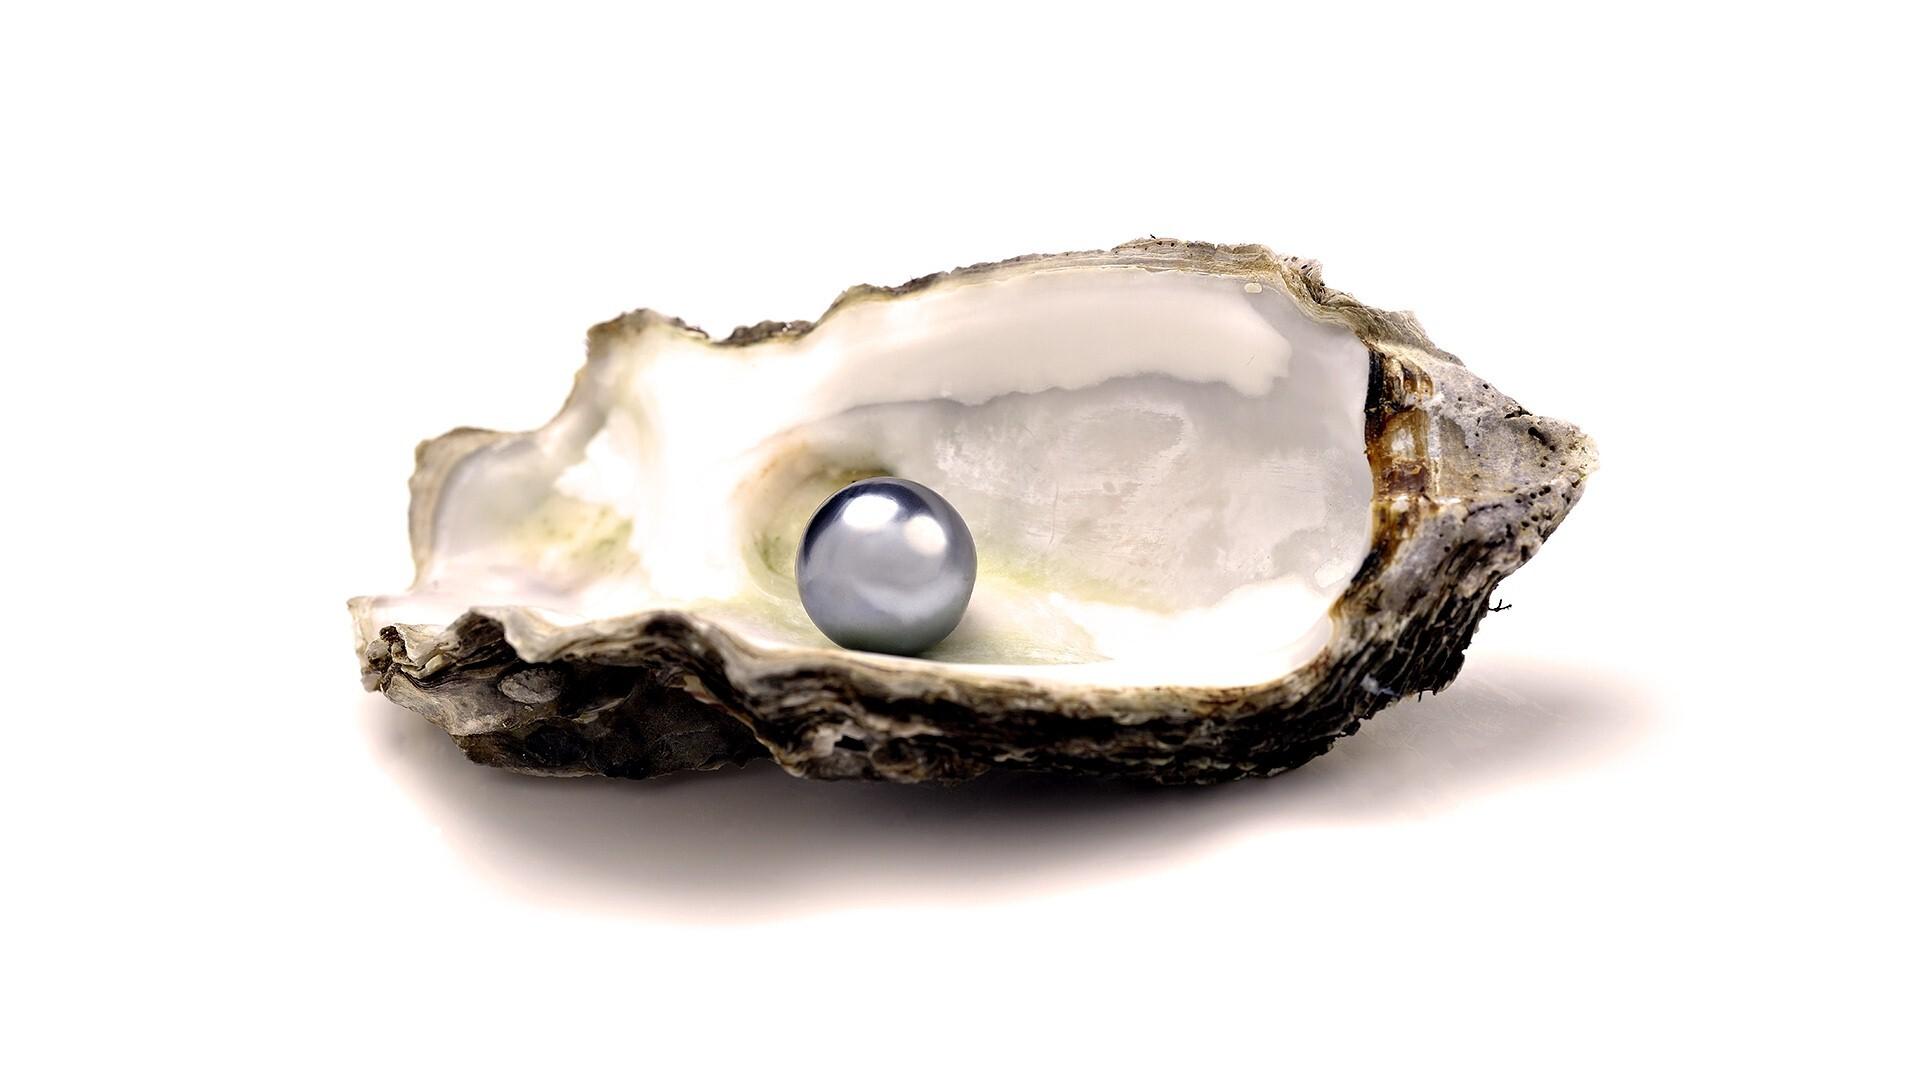 Beautiful Pearl in Sea Shell | HD Wallpapers